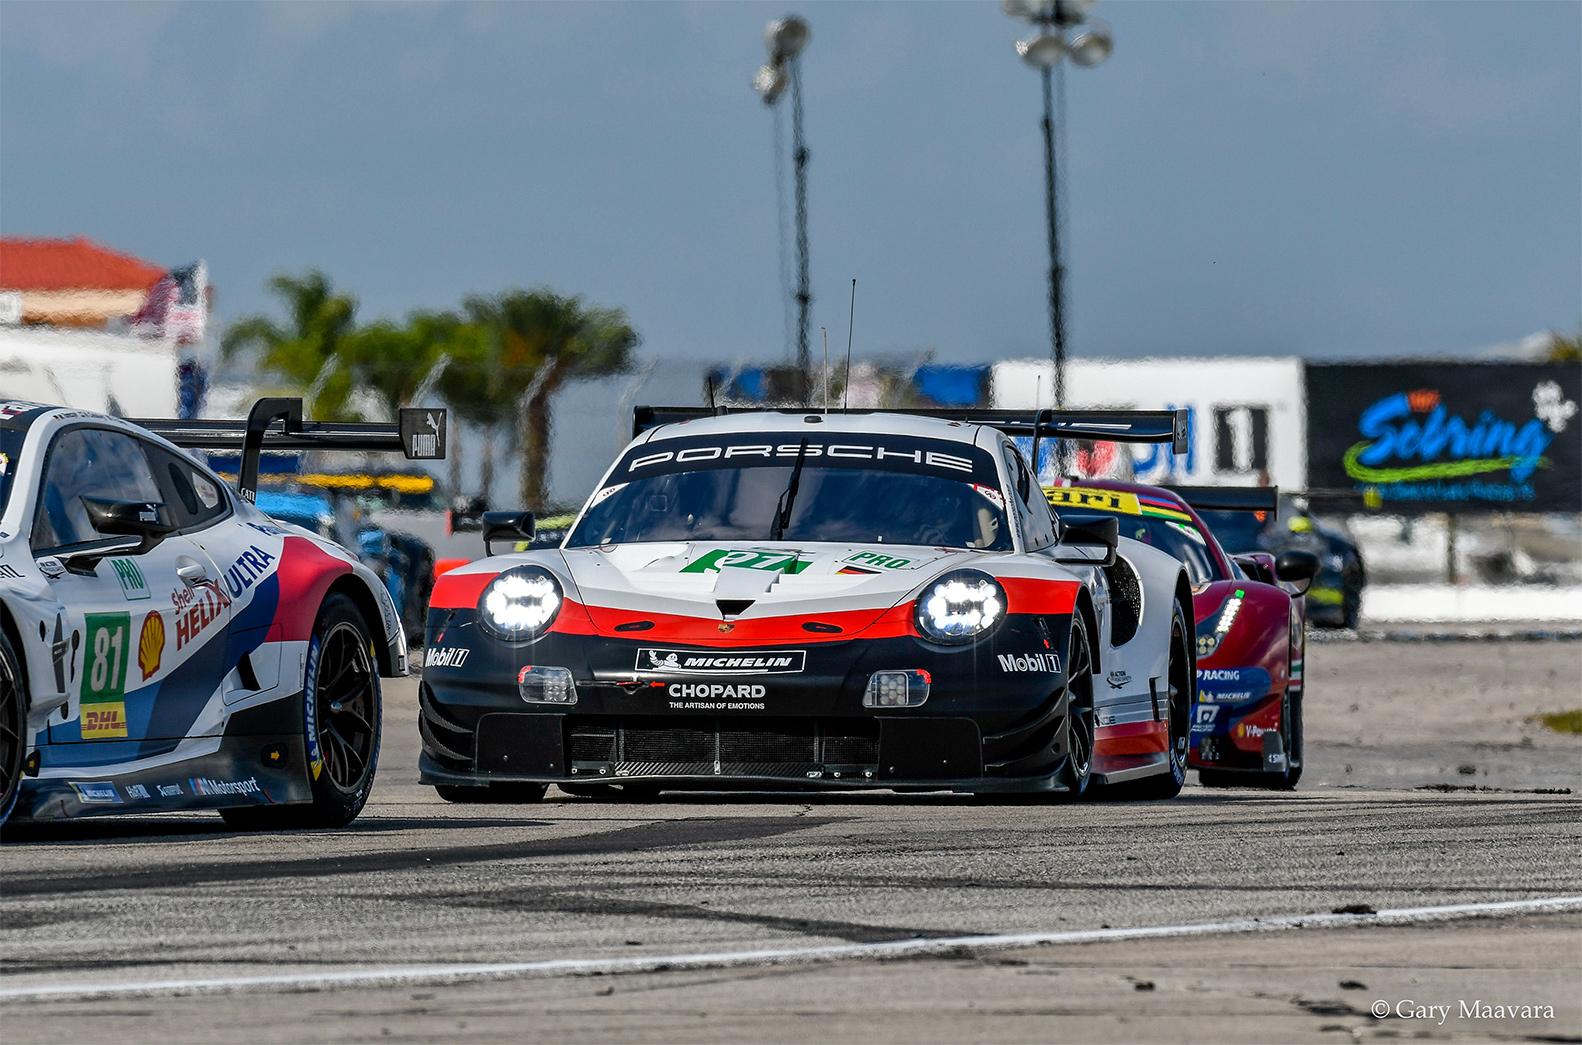 TrackWorthy - FIA WEC_race_hour one_#91_Porsche 911 RSR_ lap one